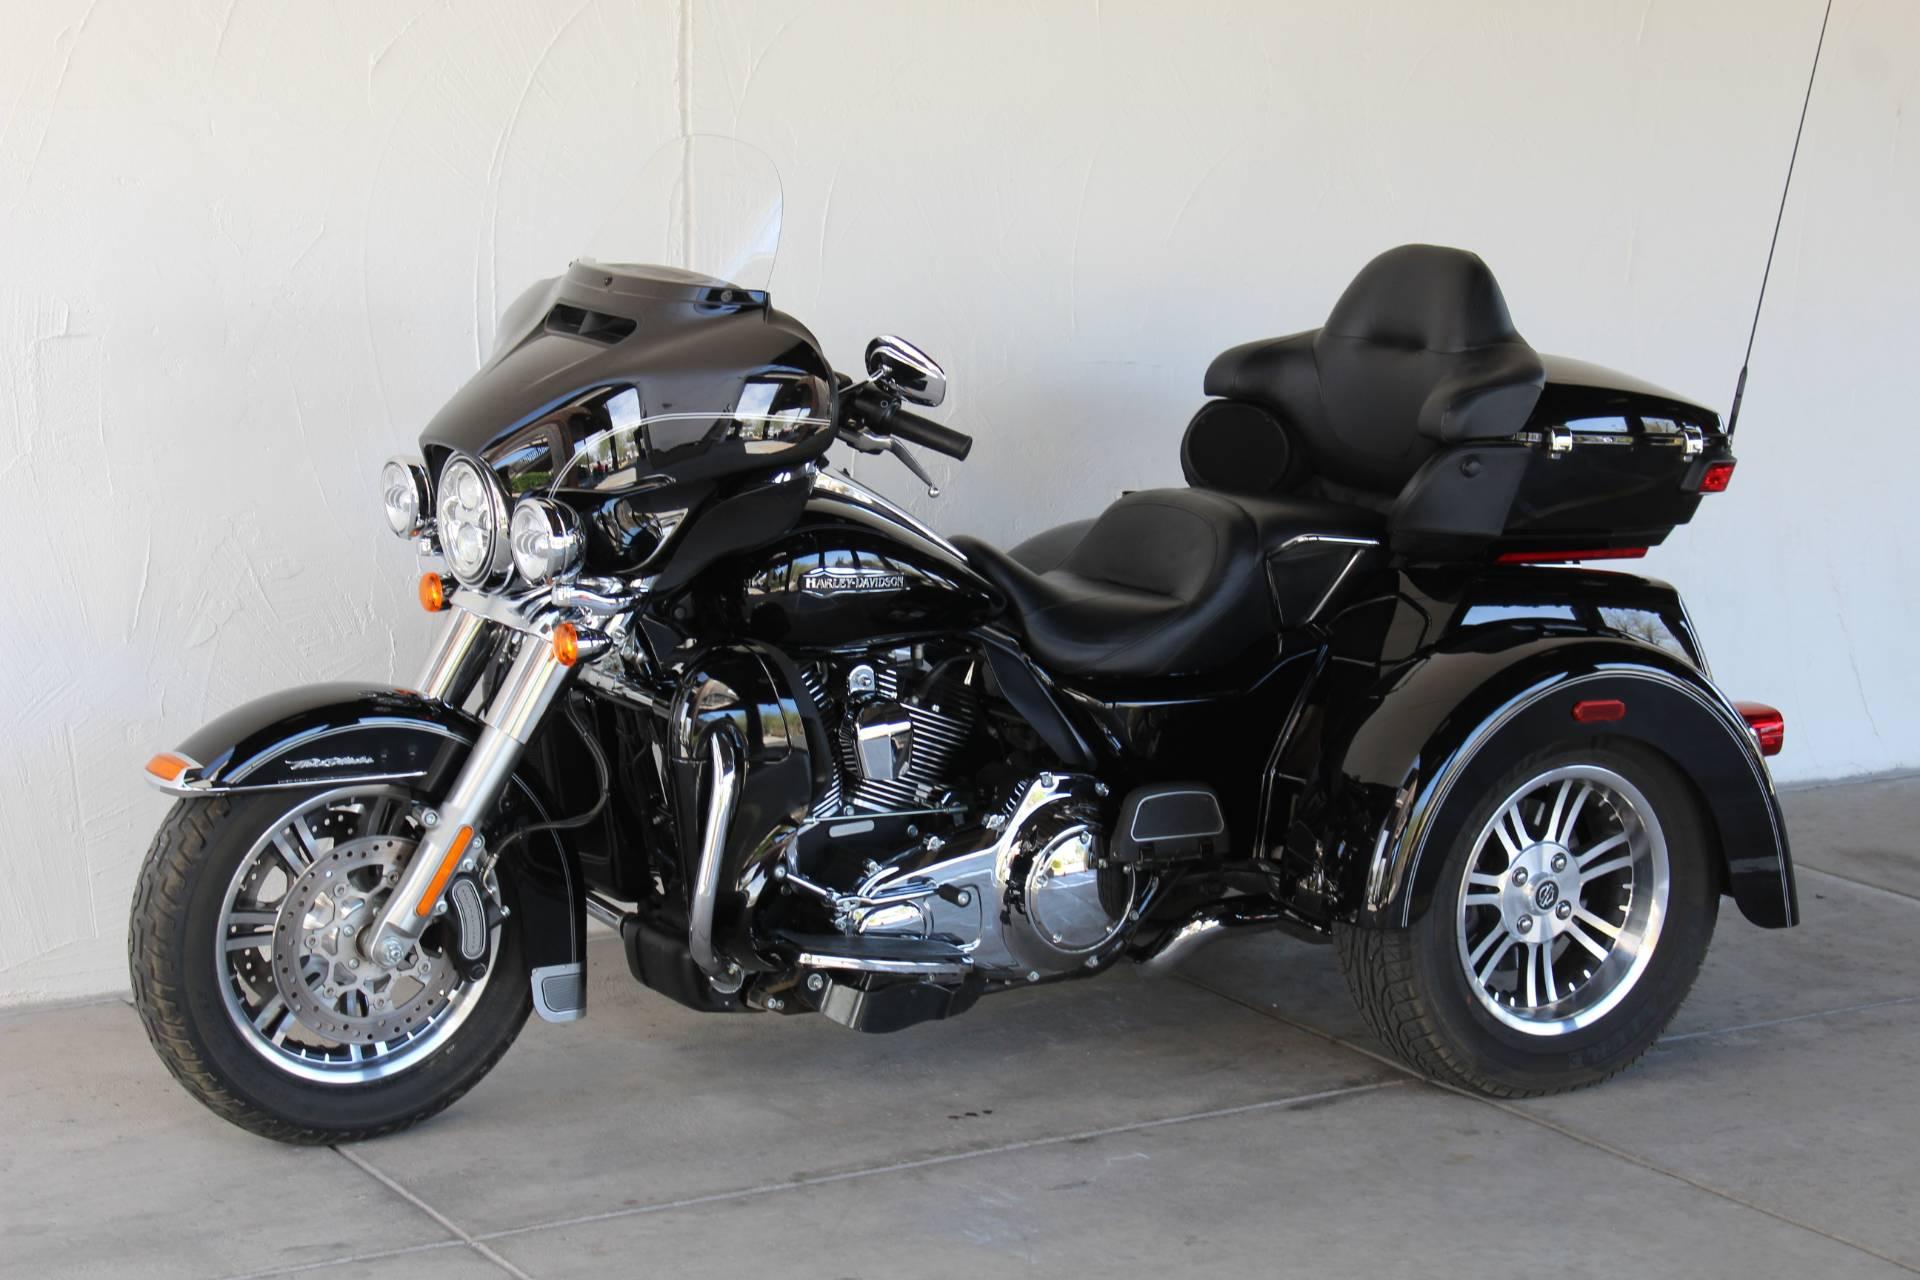 2014 Harley Davidson Tri Glide Ultra: 2014 Harley-Davidson Tri Glide® Ultra Trikes Apache